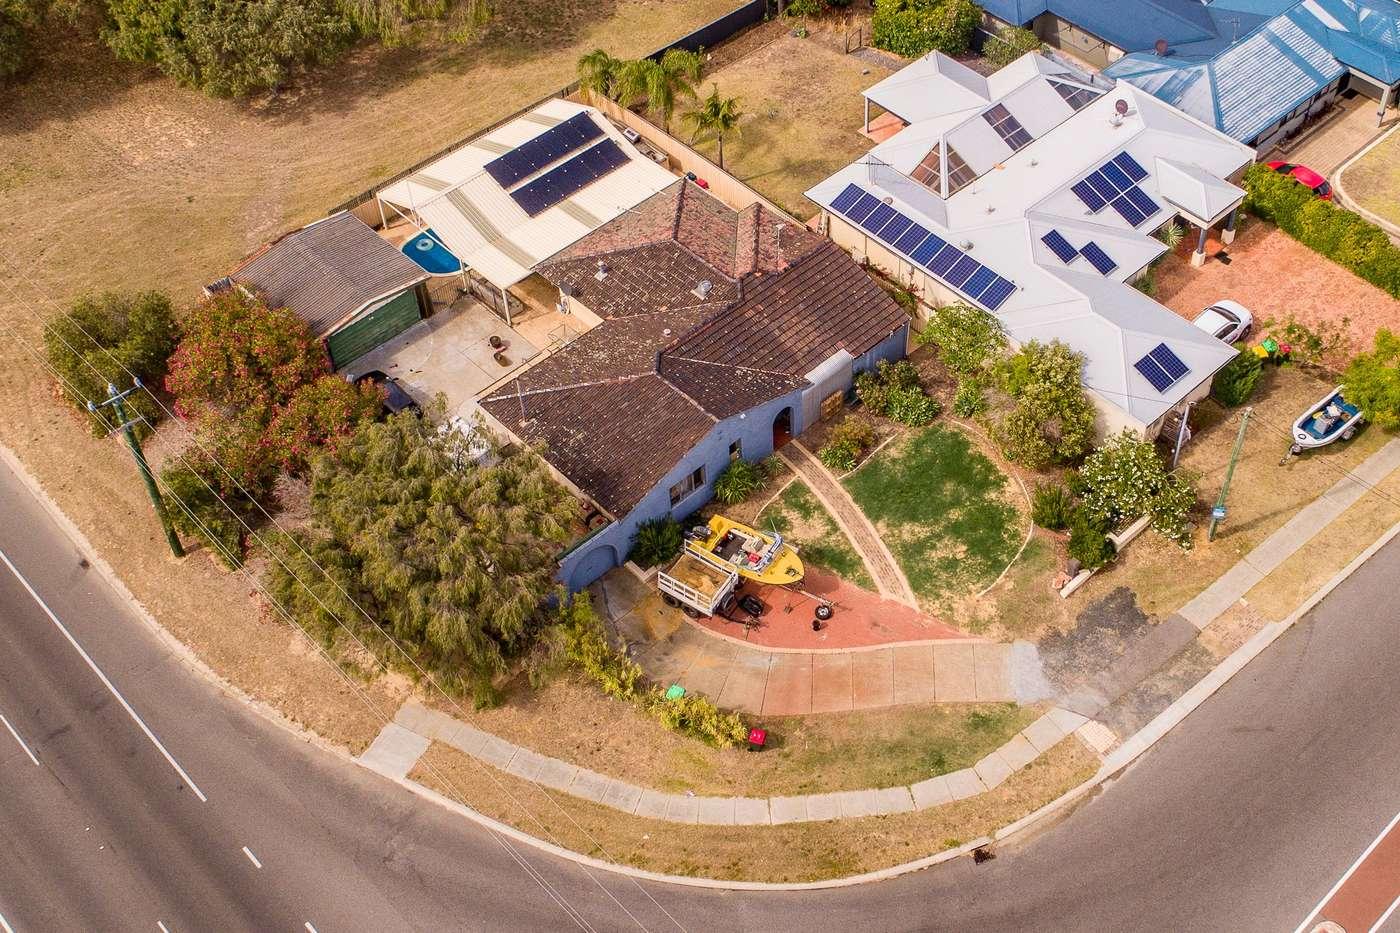 Main view of Homely house listing, 16 Cambria Street, Kallaroo, WA 6025